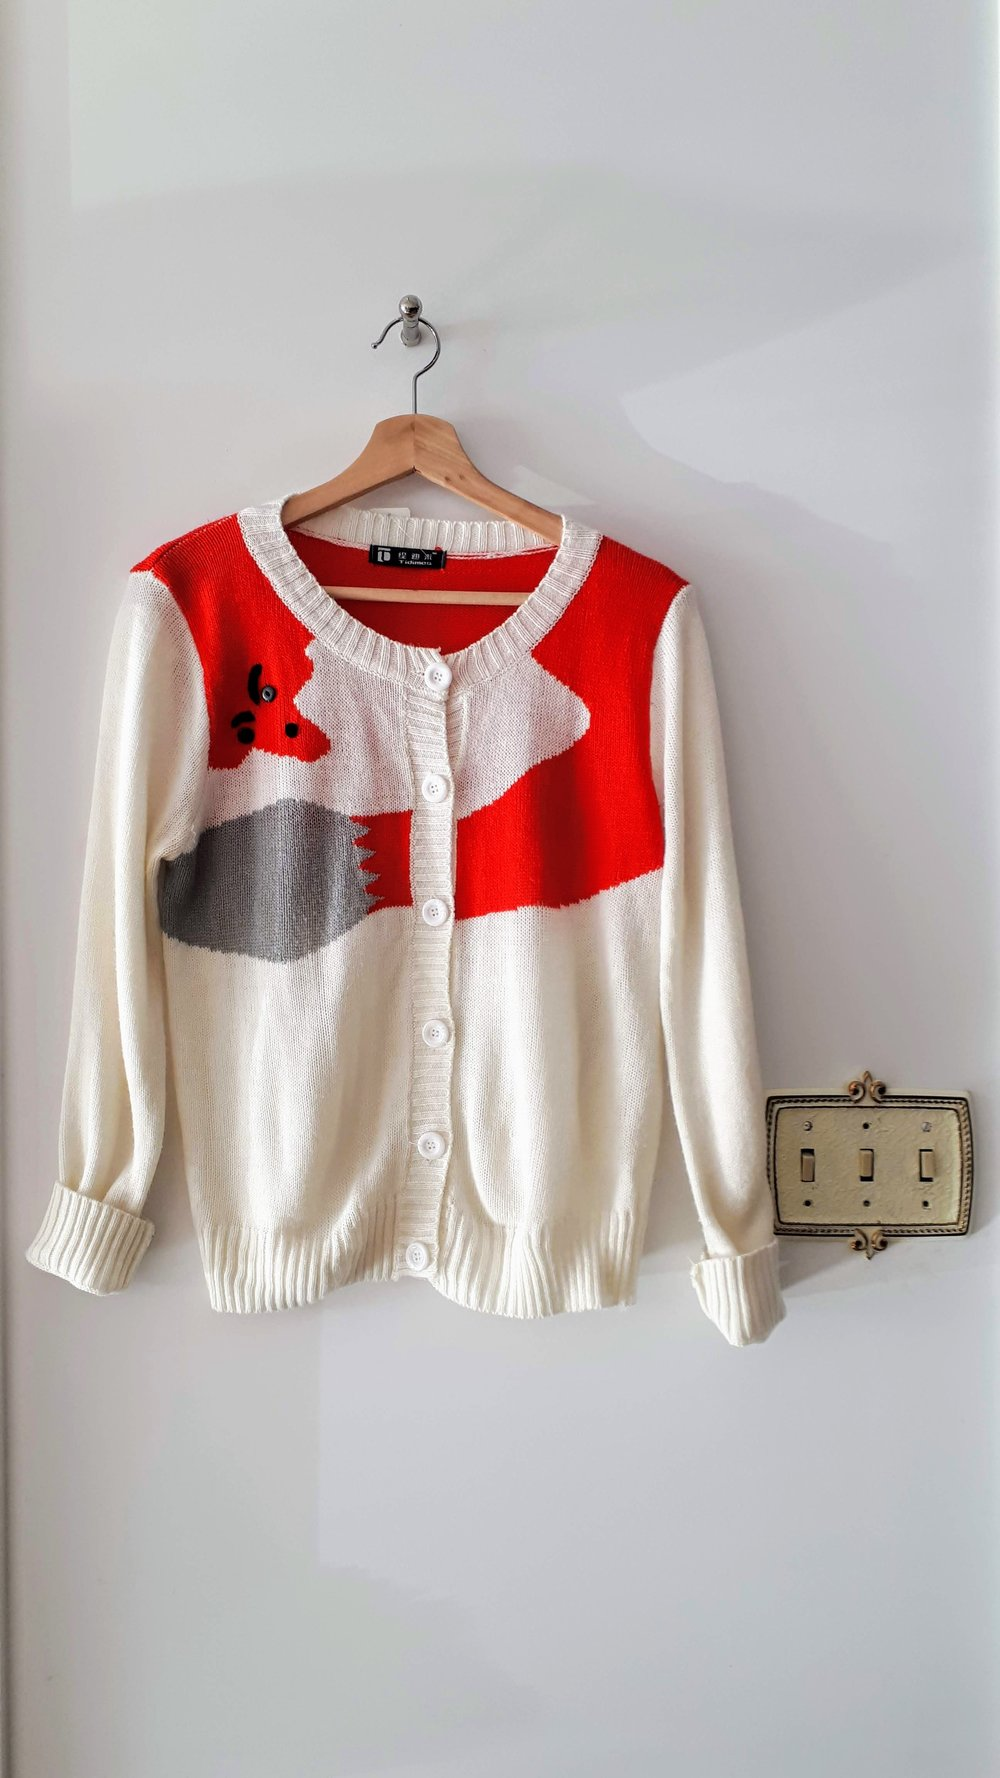 Fox cardigan; Size M, $24